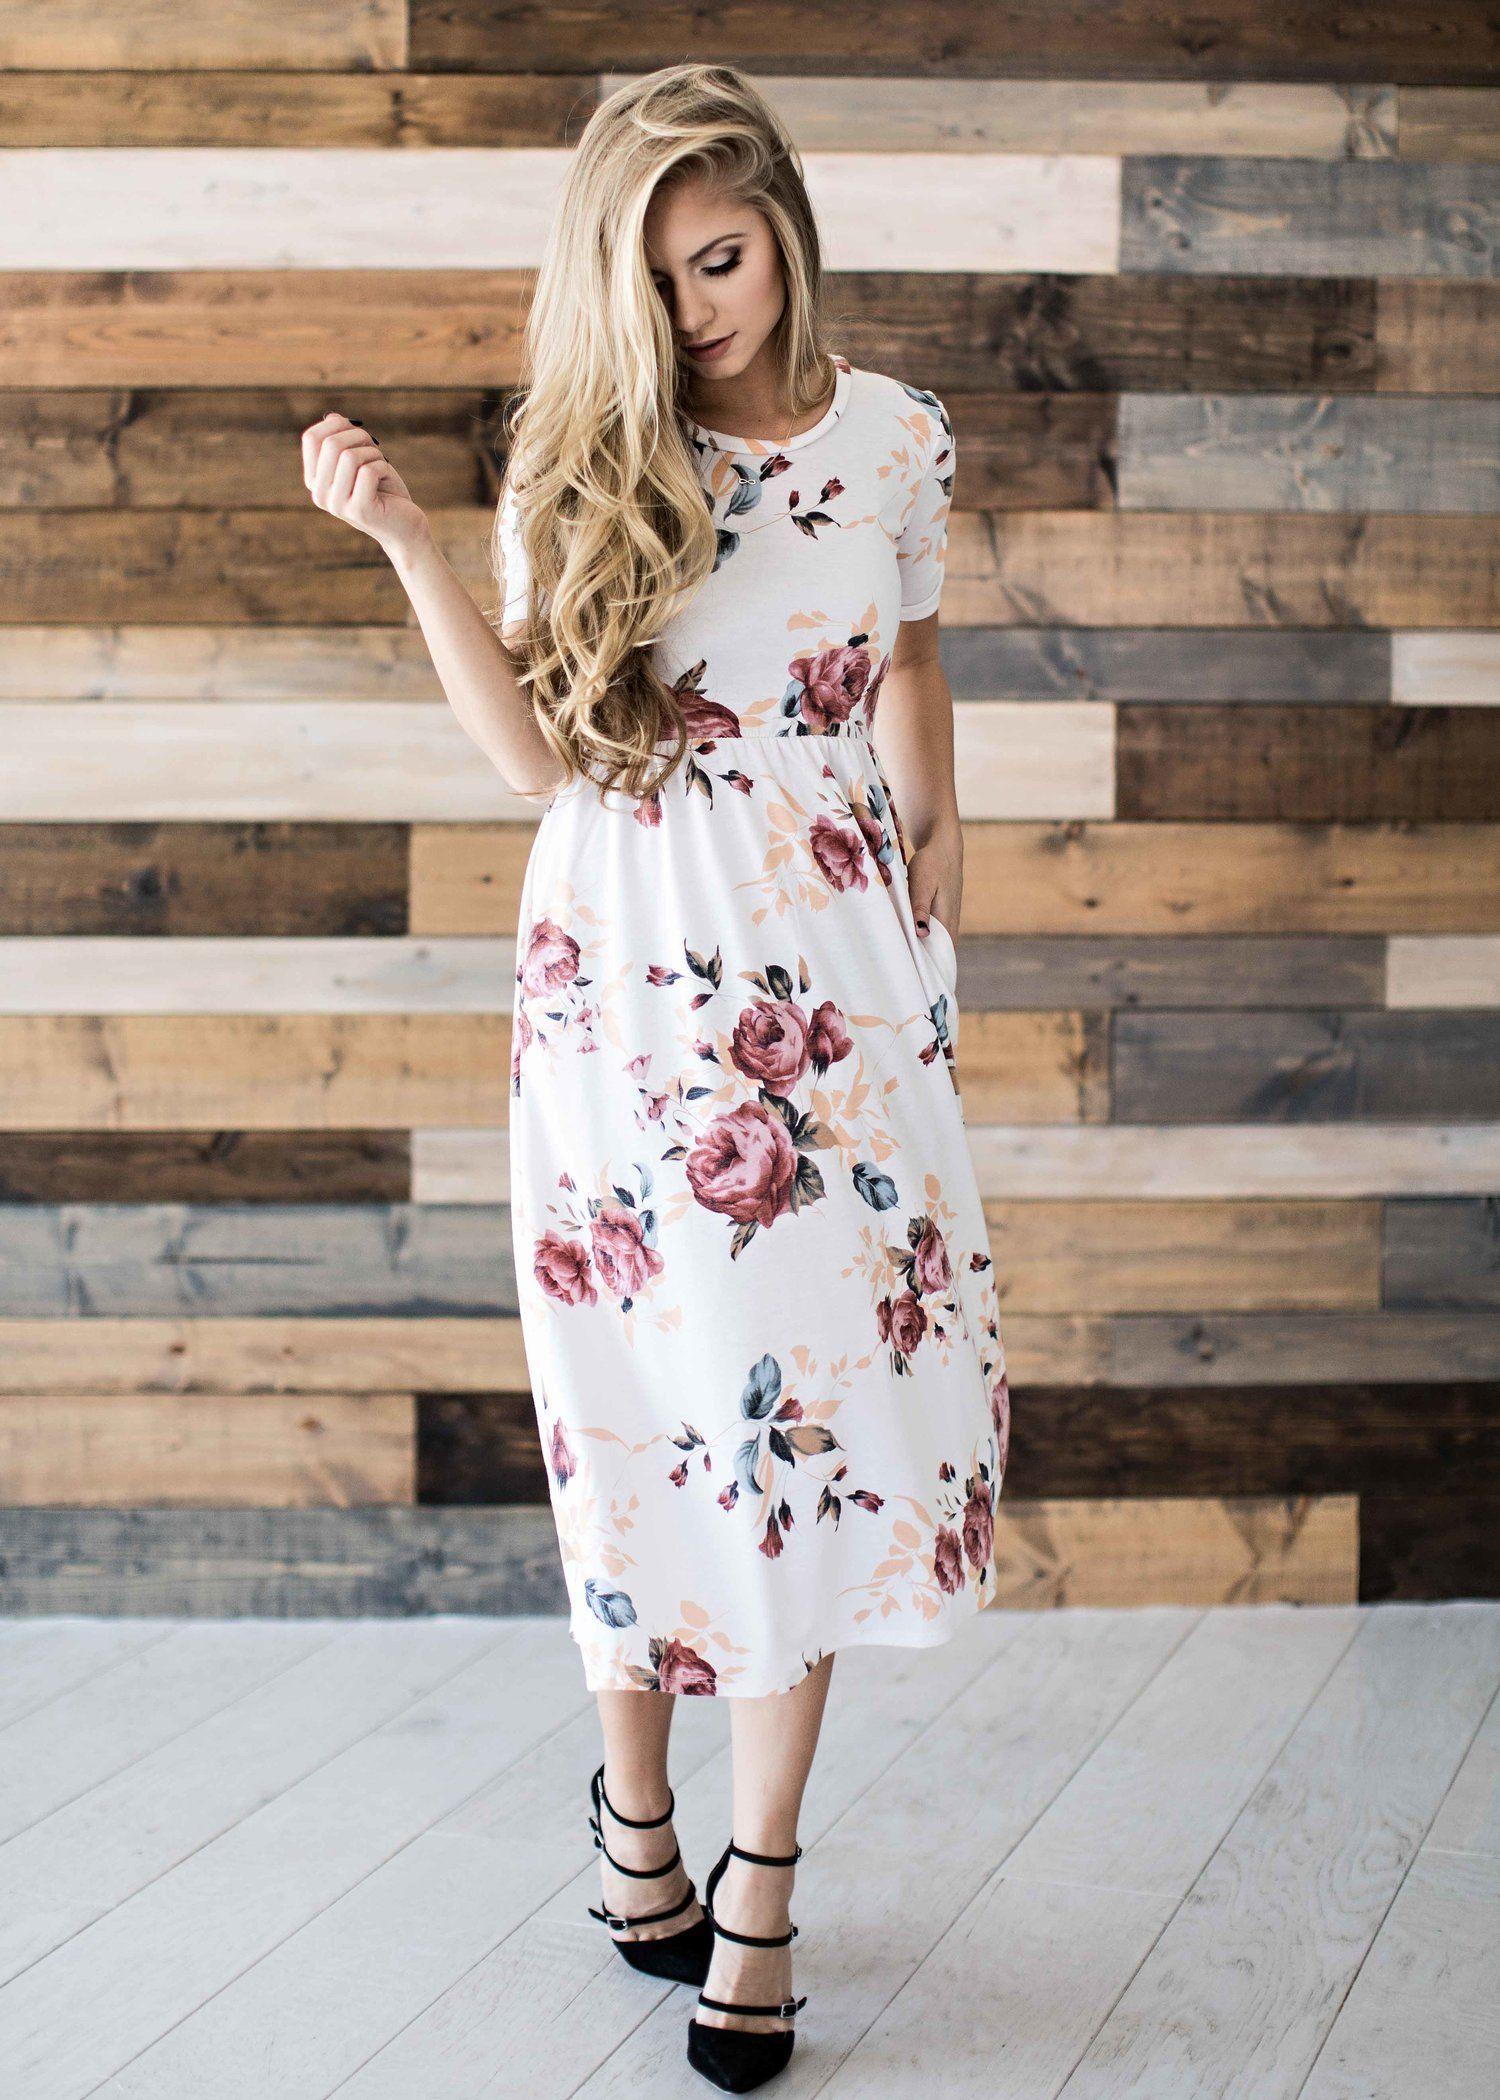 Floral Floral Dress Blonde Style Easter Dress Fashion Womens Fashion Jessakae Floral Dress Outfits White Floral Print Dress White Floral Dress Outfit [ 2100 x 1500 Pixel ]